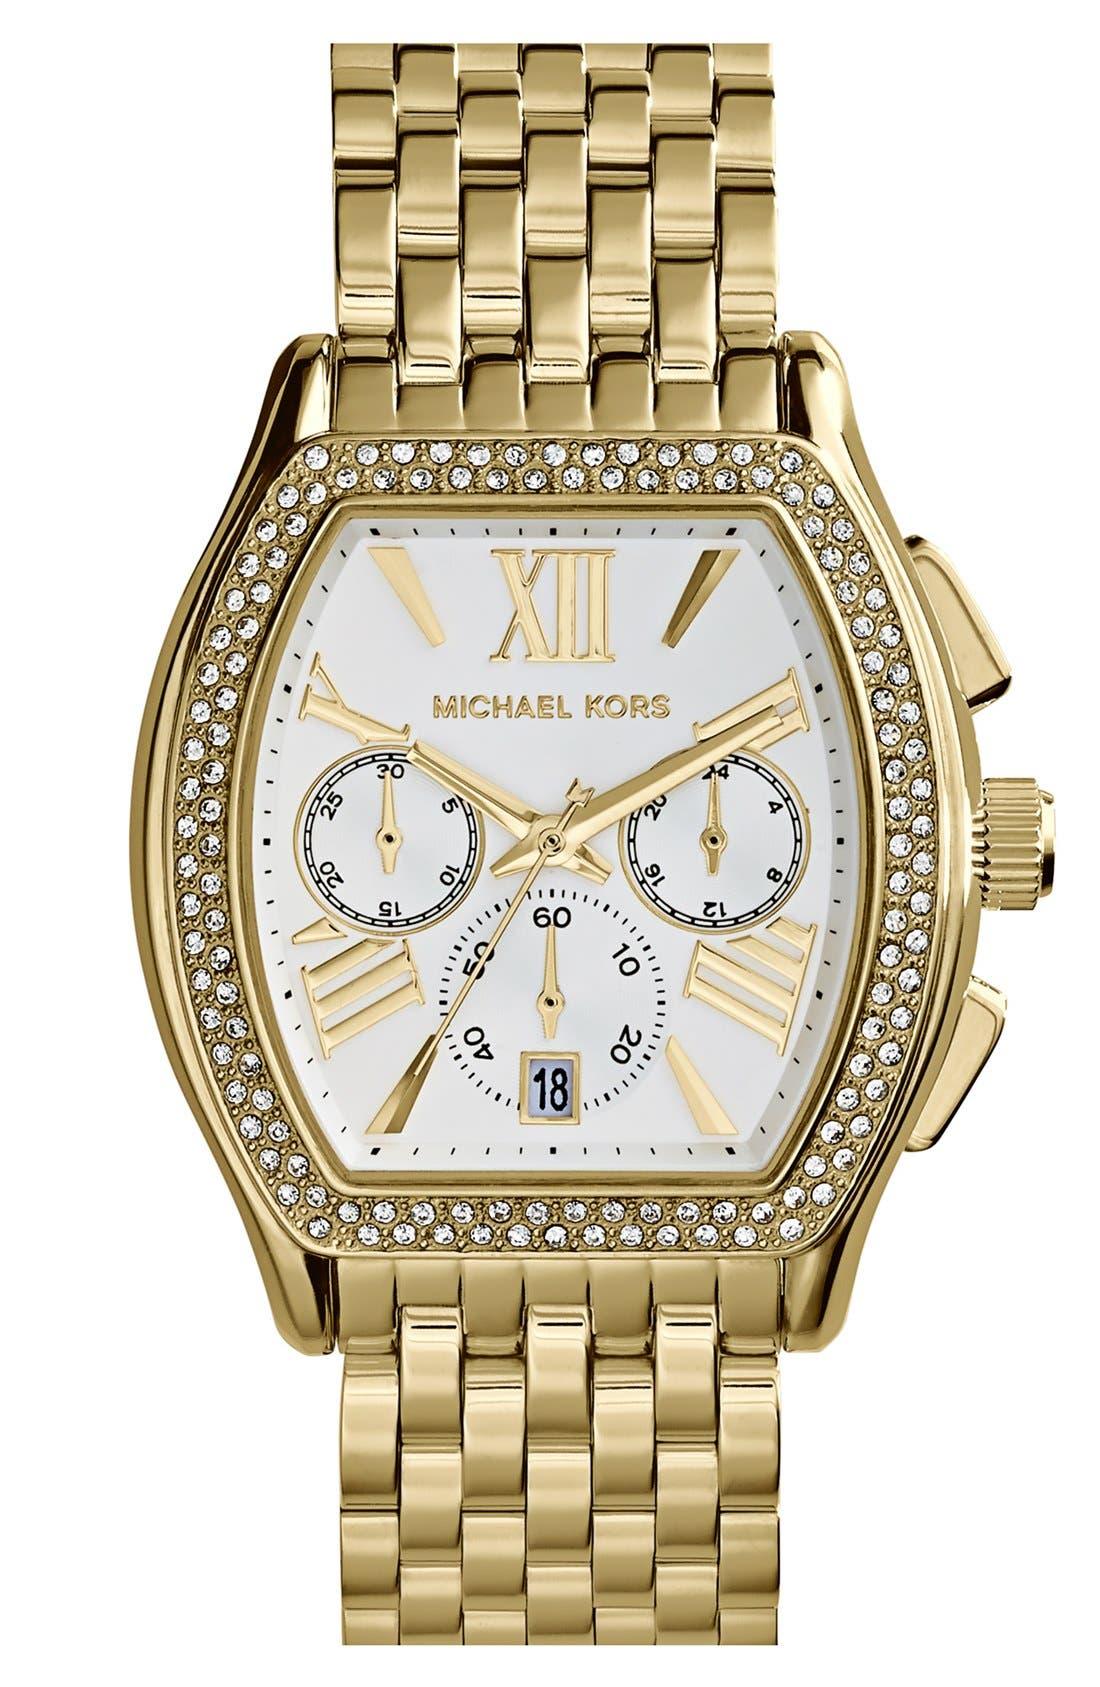 Alternate Image 1 Selected - Michael Kors 'Amherst' Crystal Bezel Chronograph Bracelet Watch, 38mm